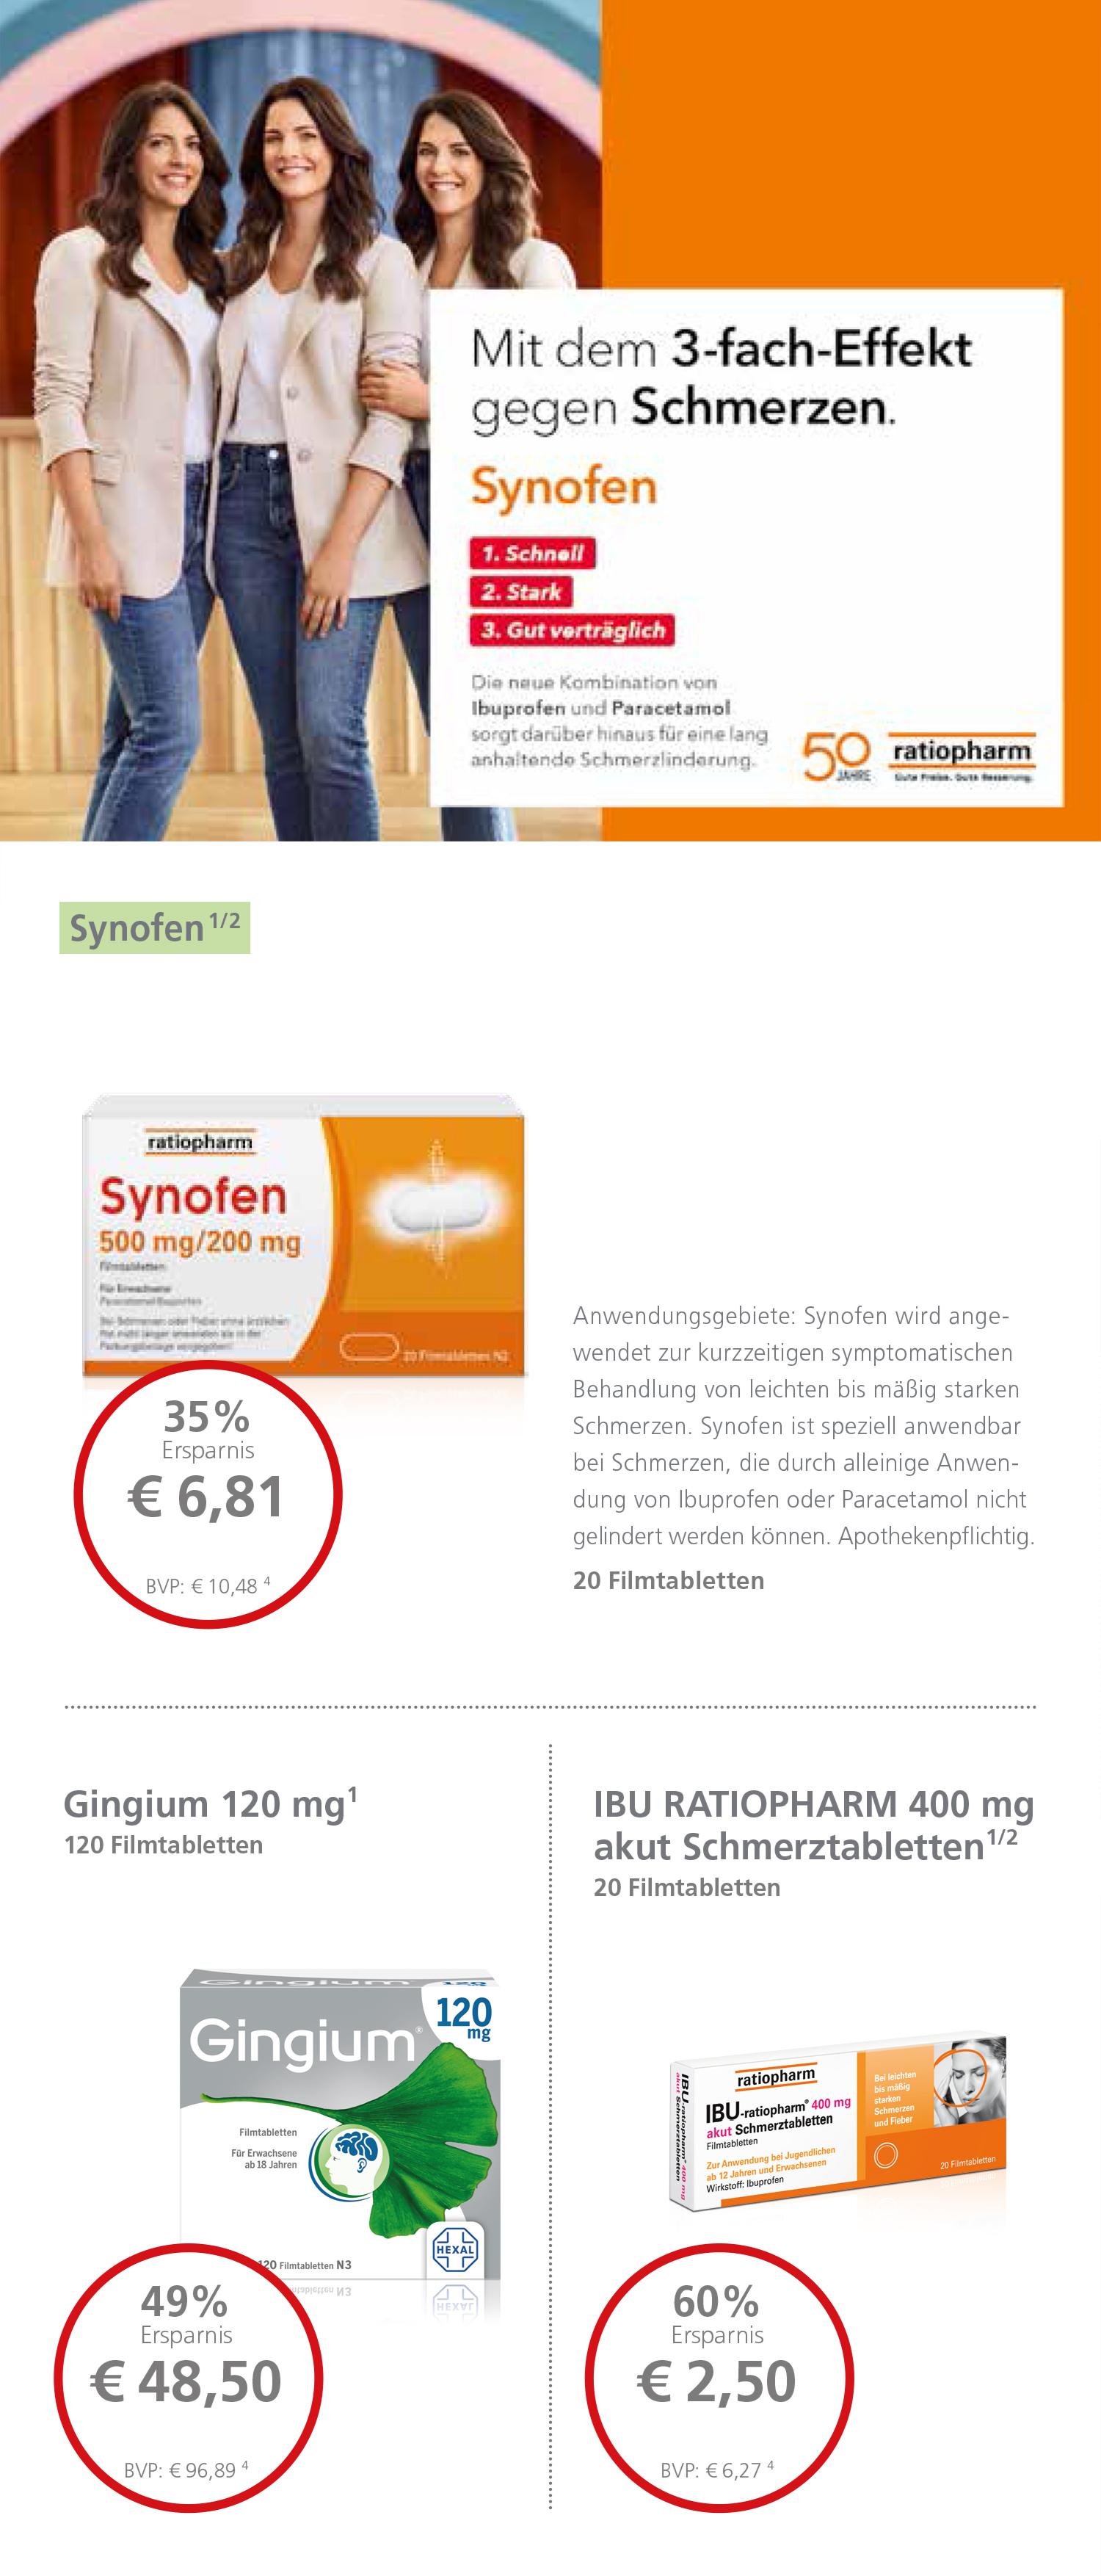 https://mein-uploads.apocdn.net/17978/leaflets/17978_flyer-Seite7.png